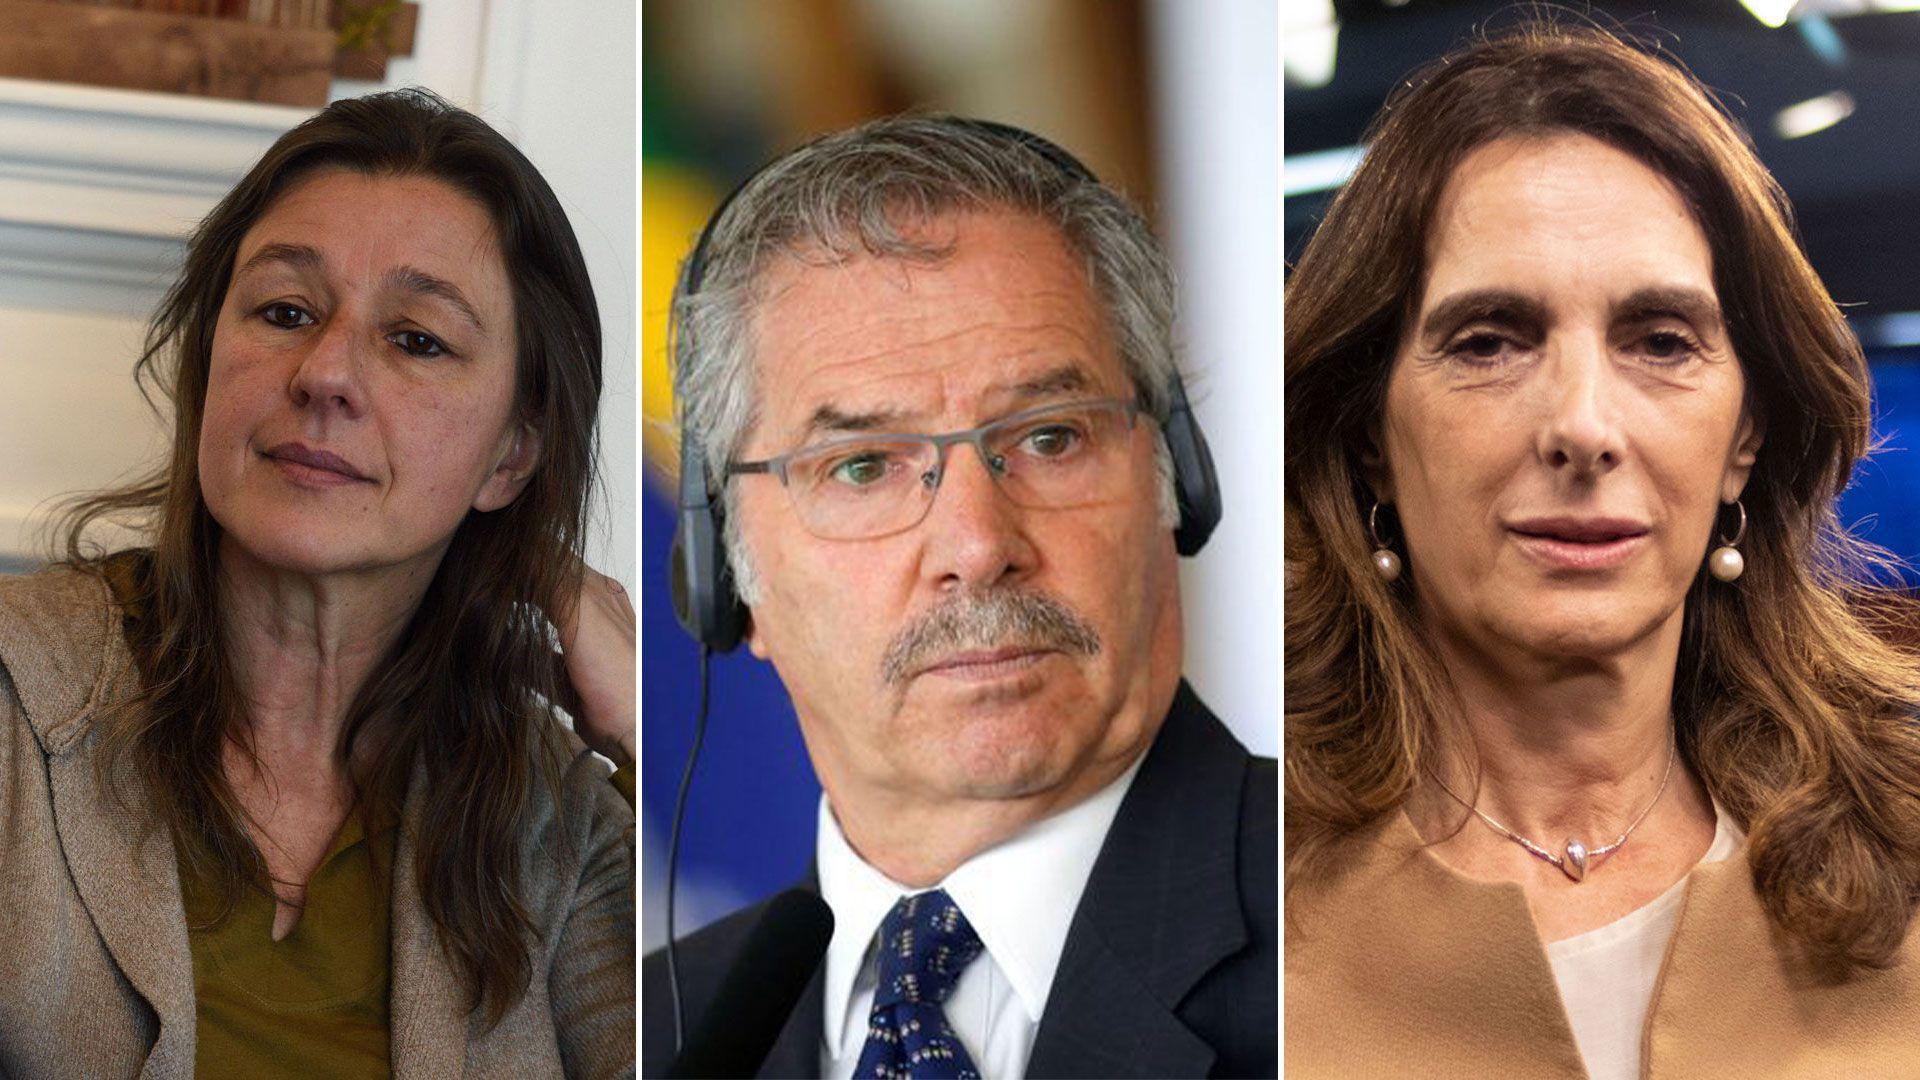 Gabinete Nacional - Sabina Frederic, Felipe Sola y Maria Eugenia Bielsa